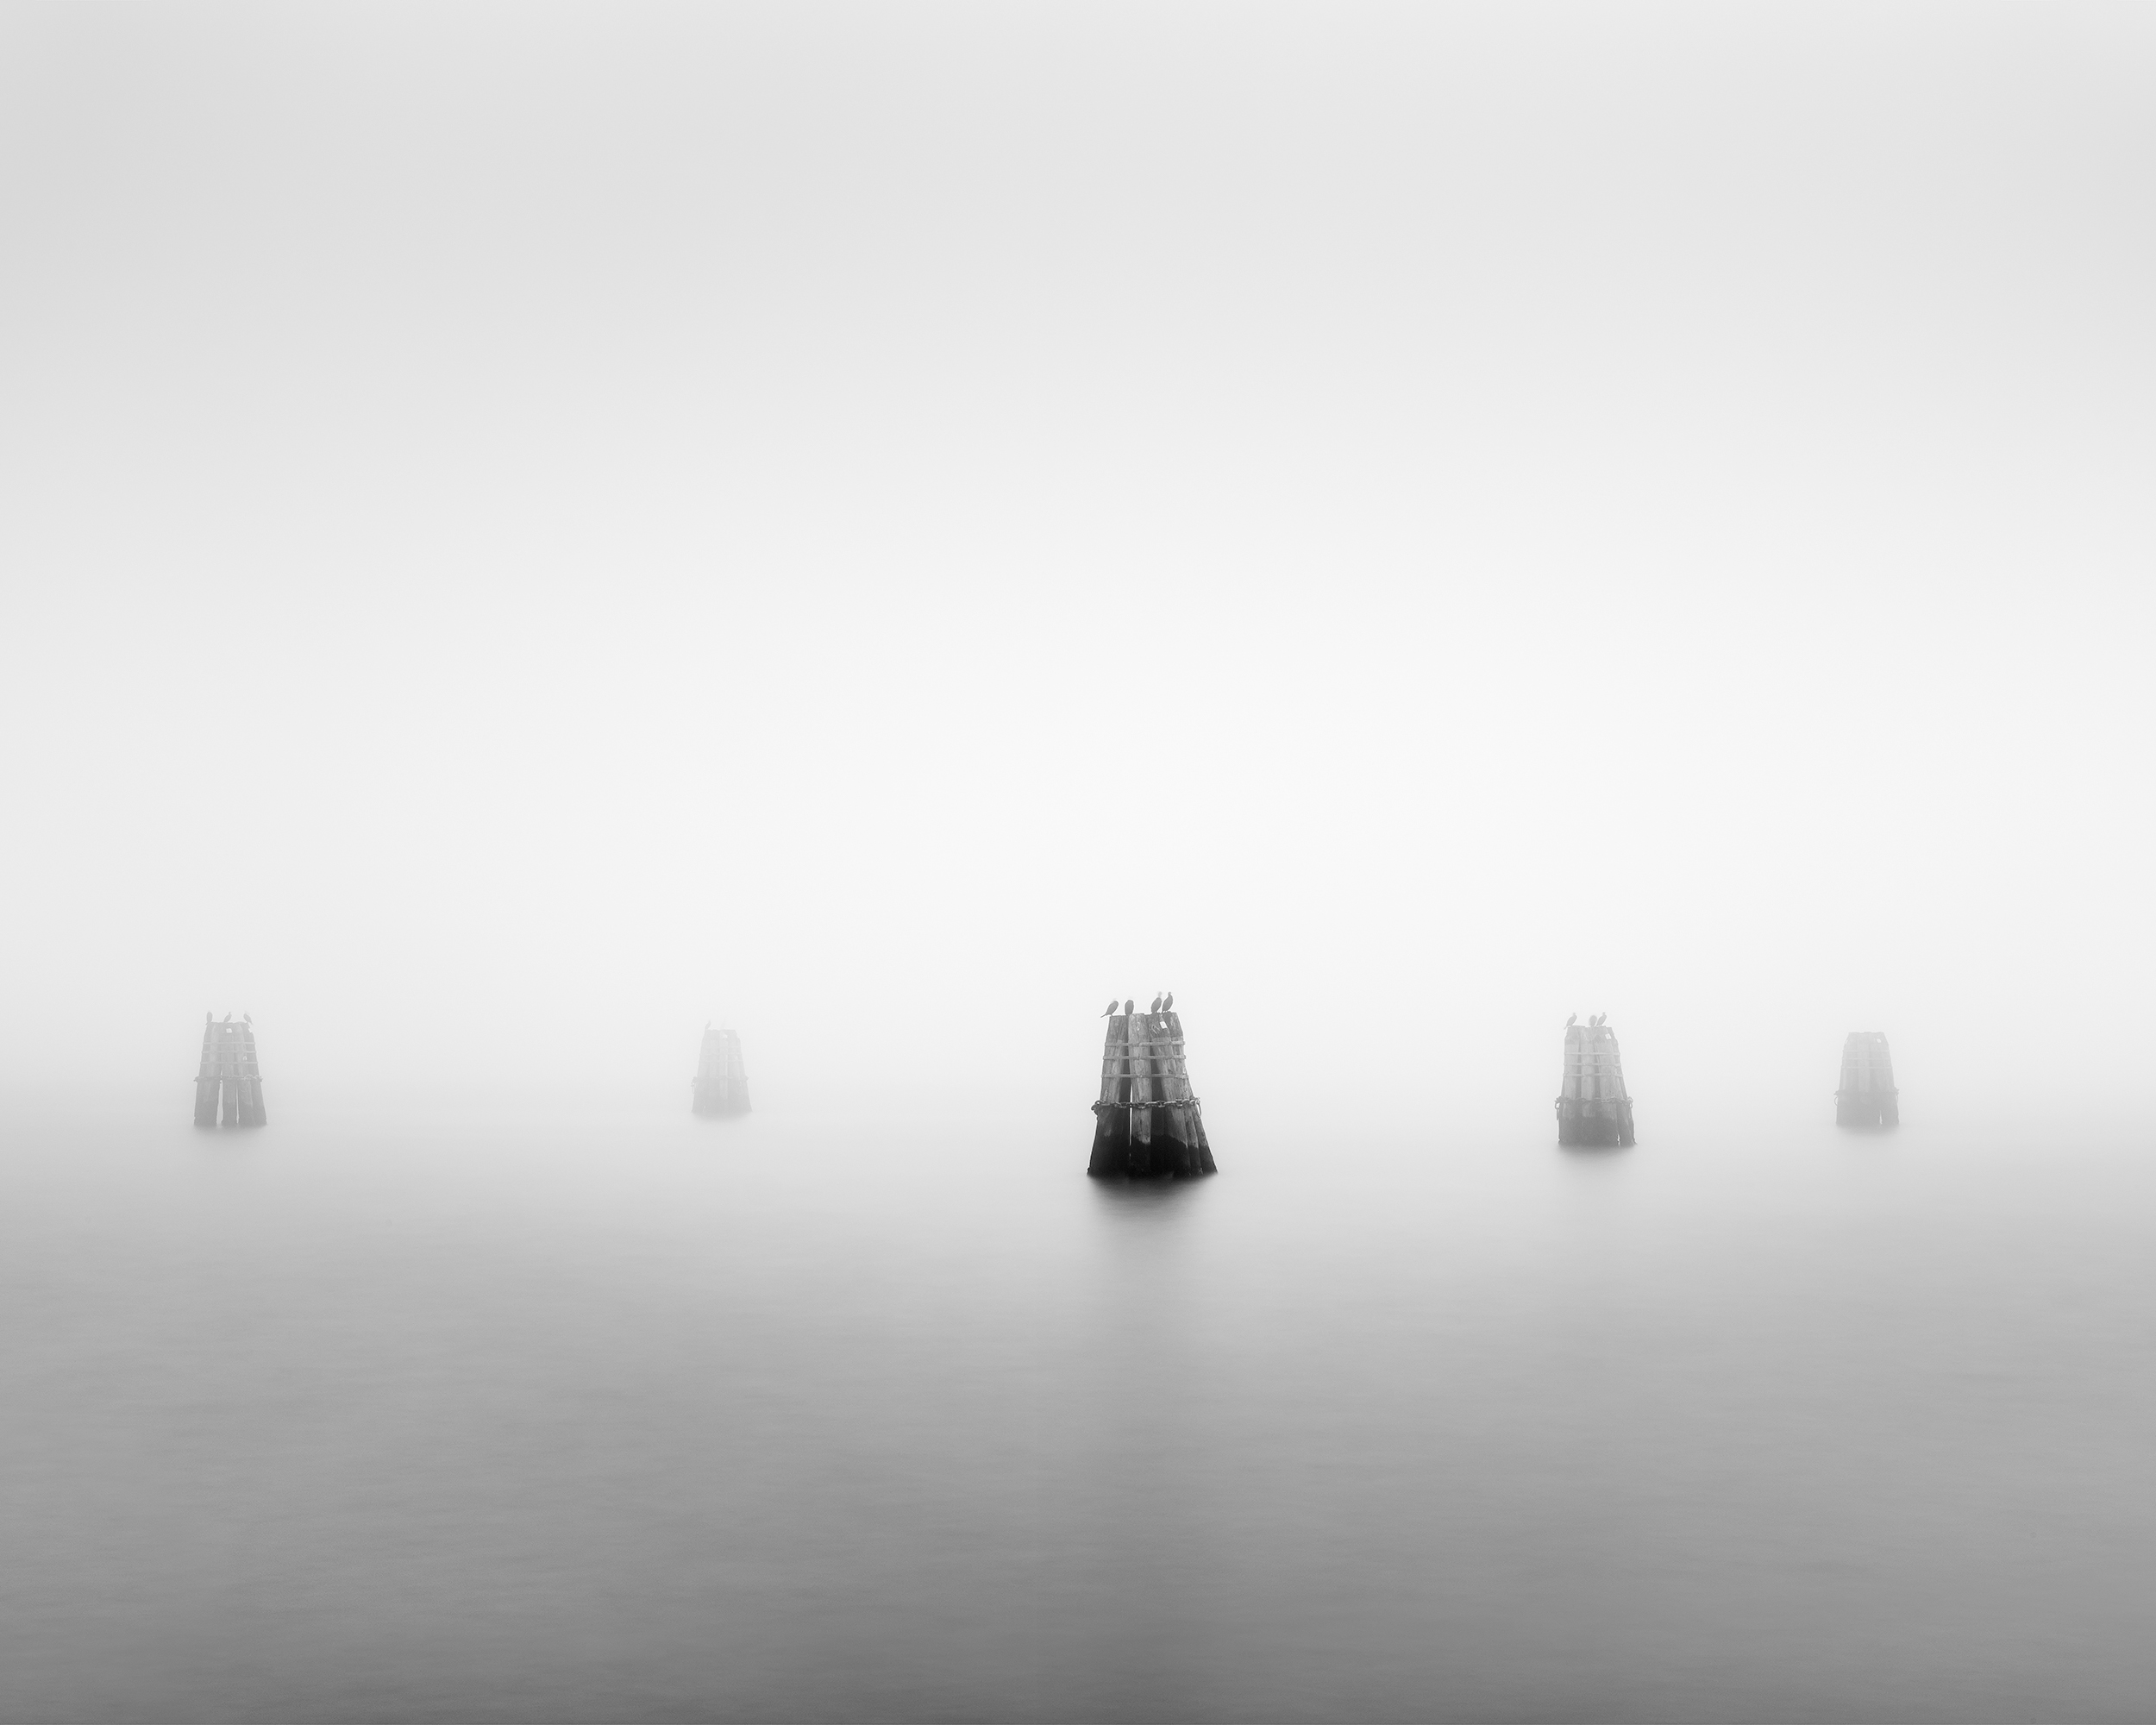 Venice Lagoon Study 1 - Venice (2550)